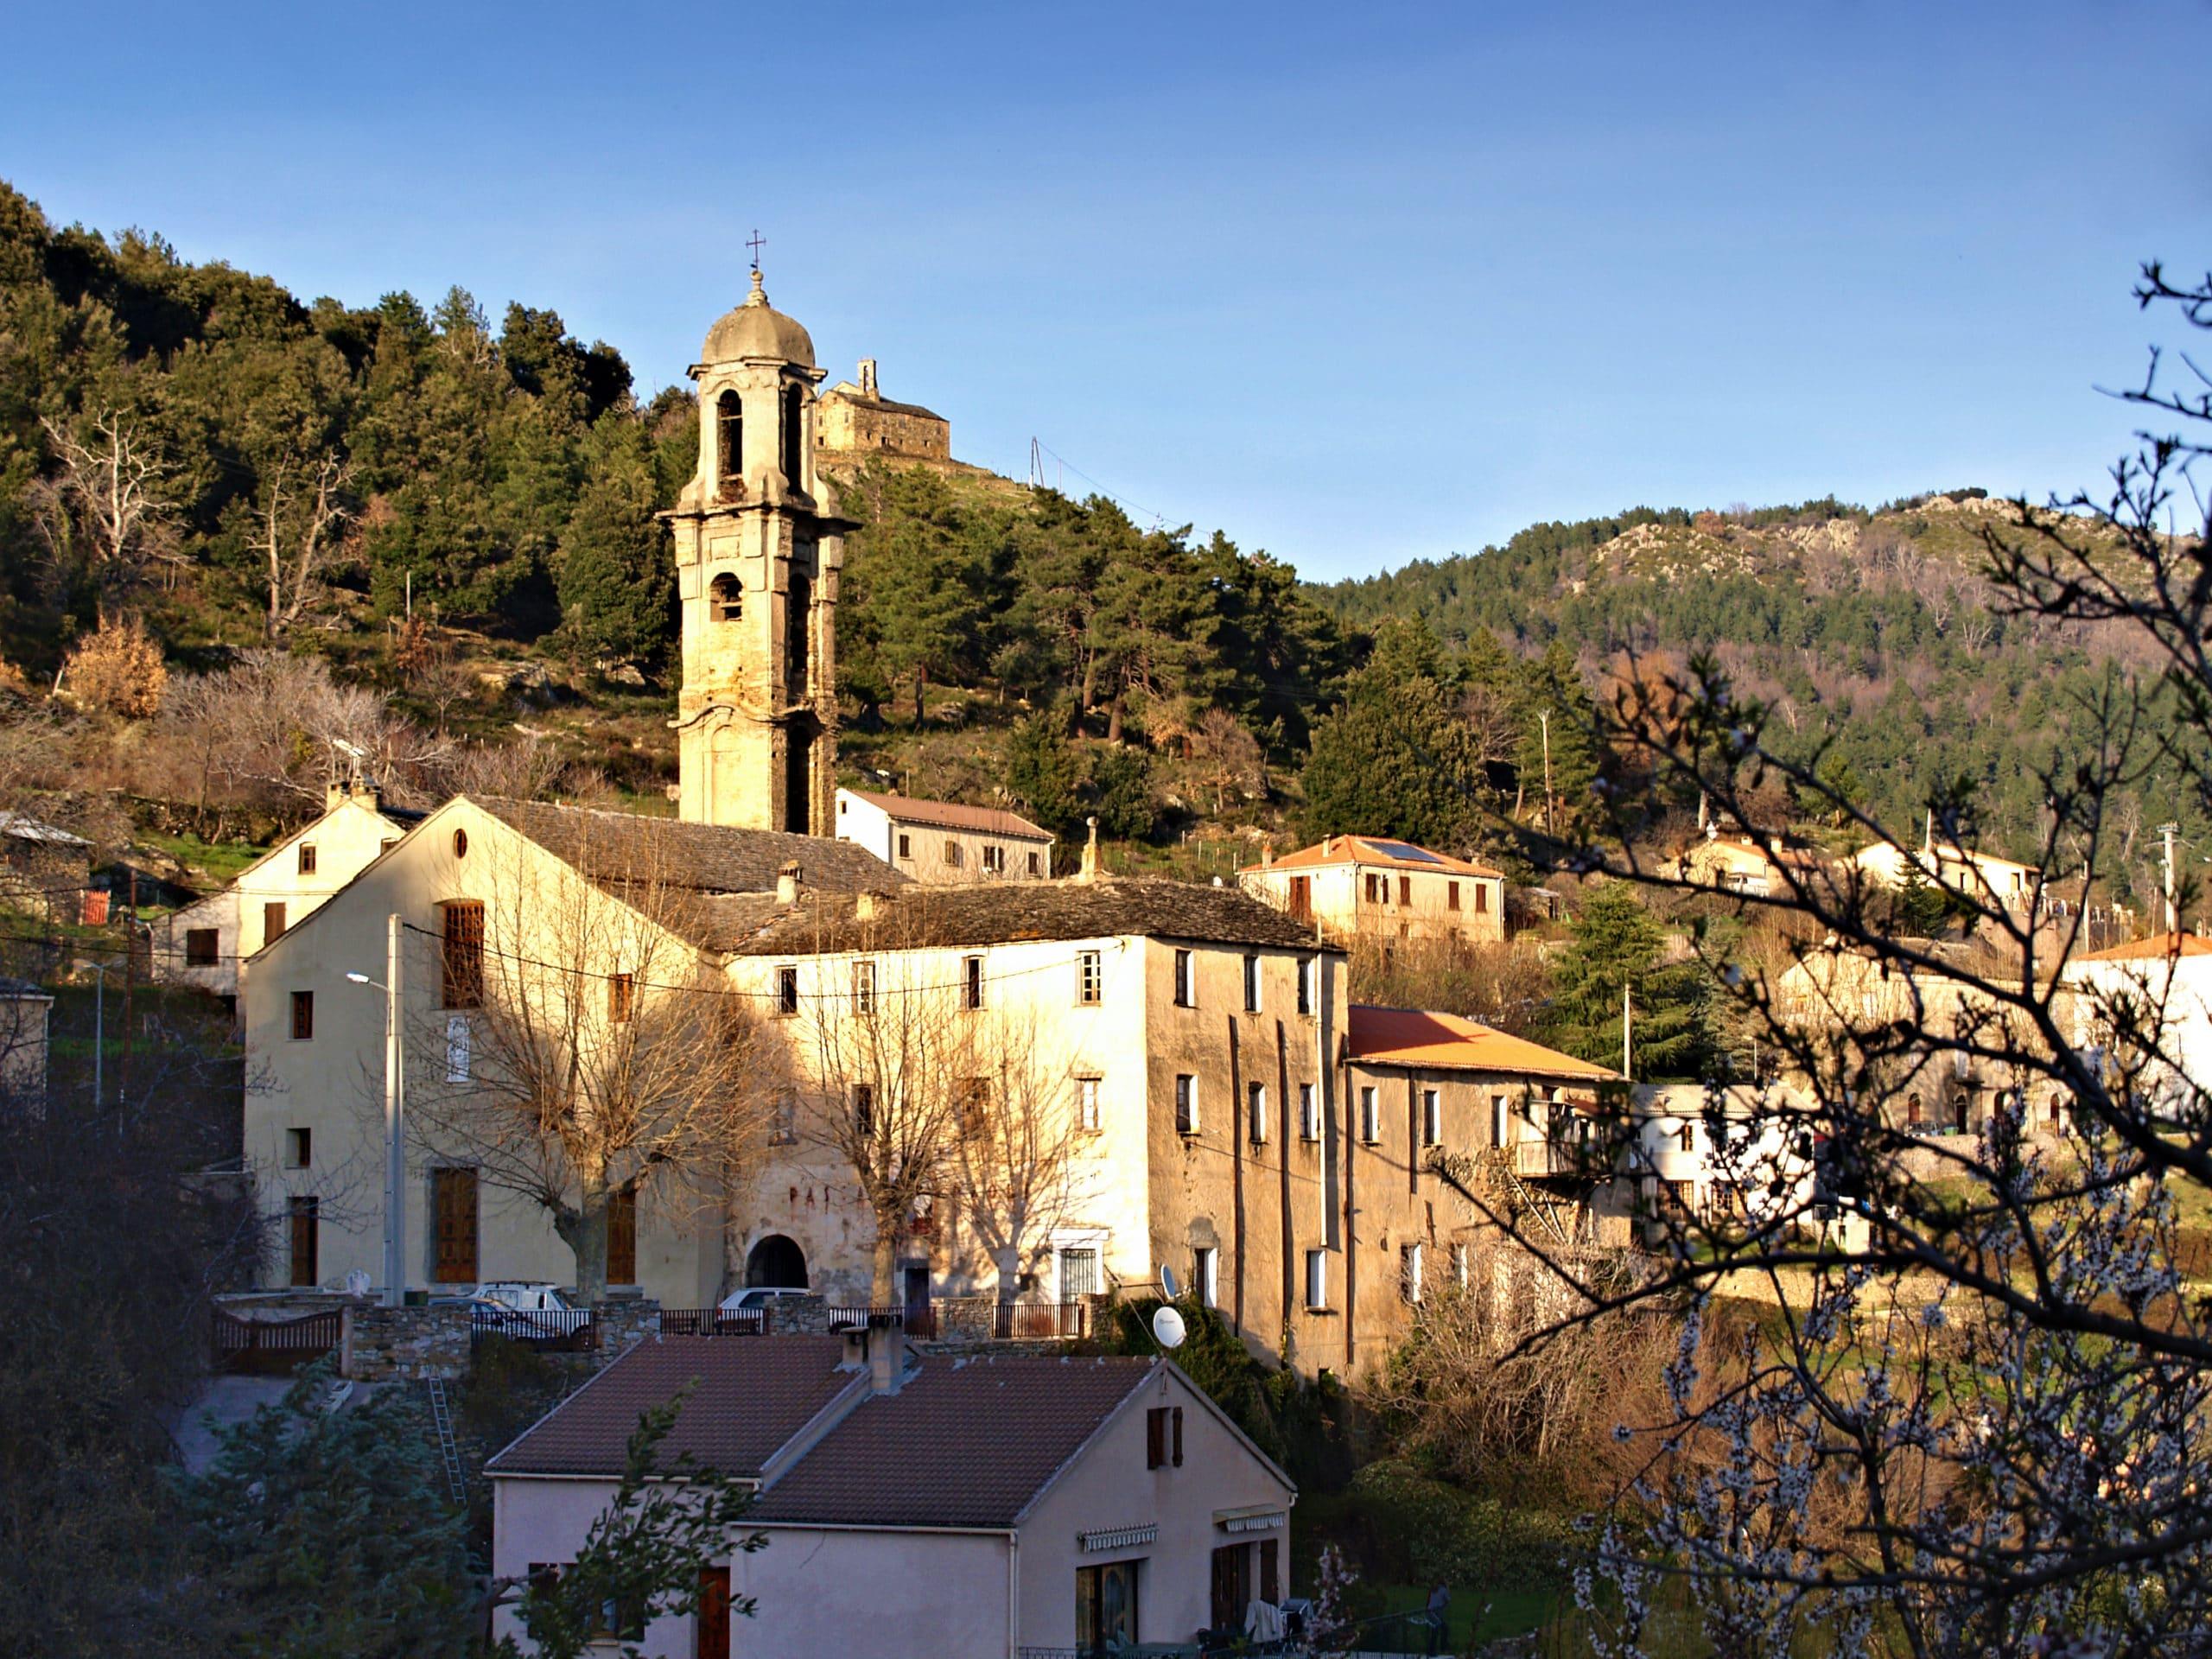 https://fr.wikipedia.org/wiki/Morosaglia#/media/Fichier:Morosaglia-Eglise-3.jpg